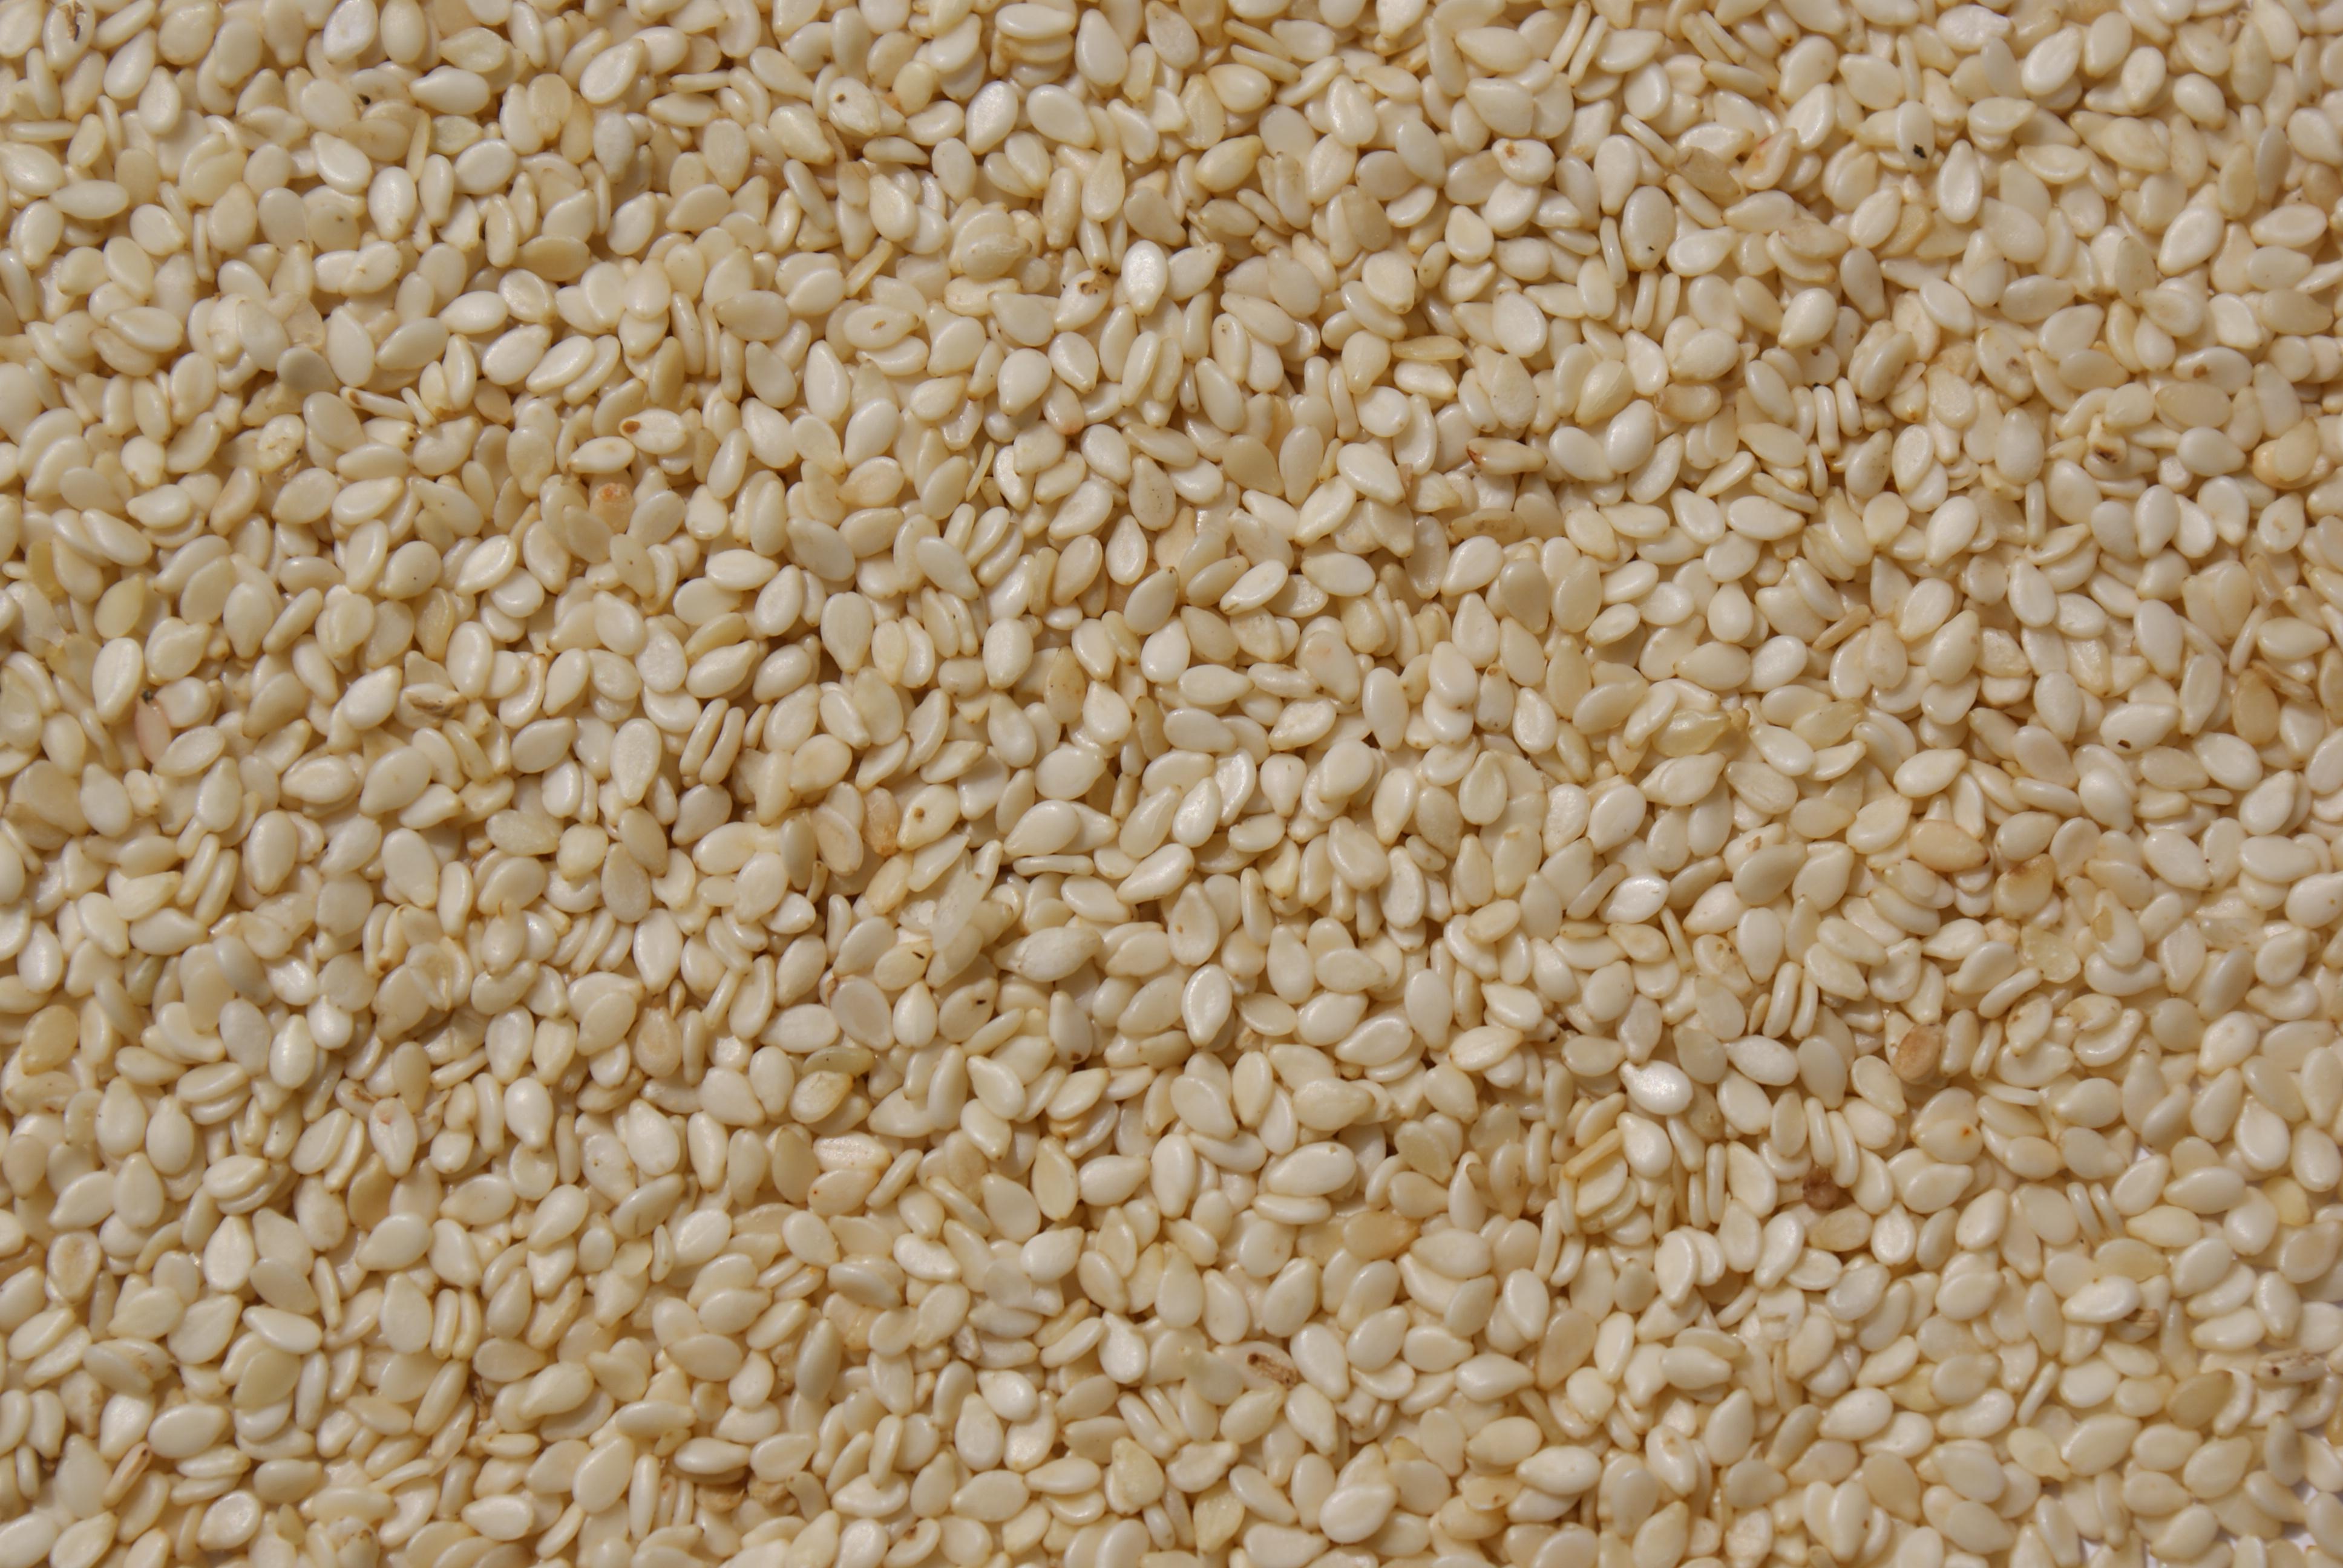 sesame production Soils, plant growth and crop production – growth and production of sesame – elly kafiriti and omari mponda ©encyclopedia.